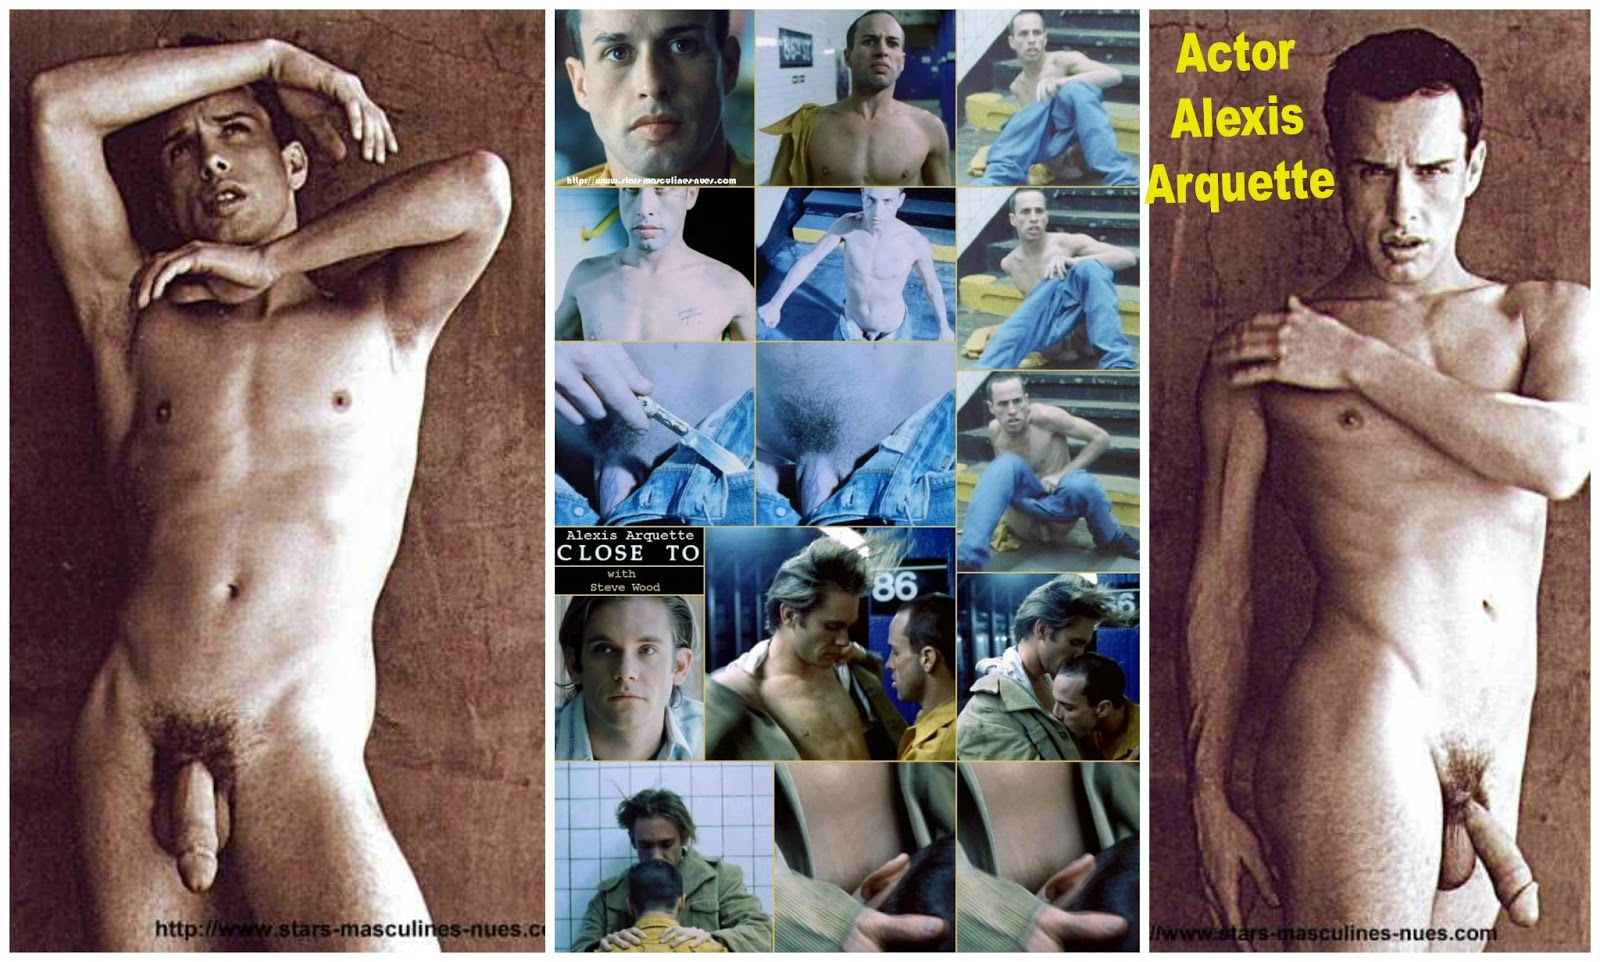 pornstars-thumbnails-alexis-arrquette-nude-girl-orgasm-mary